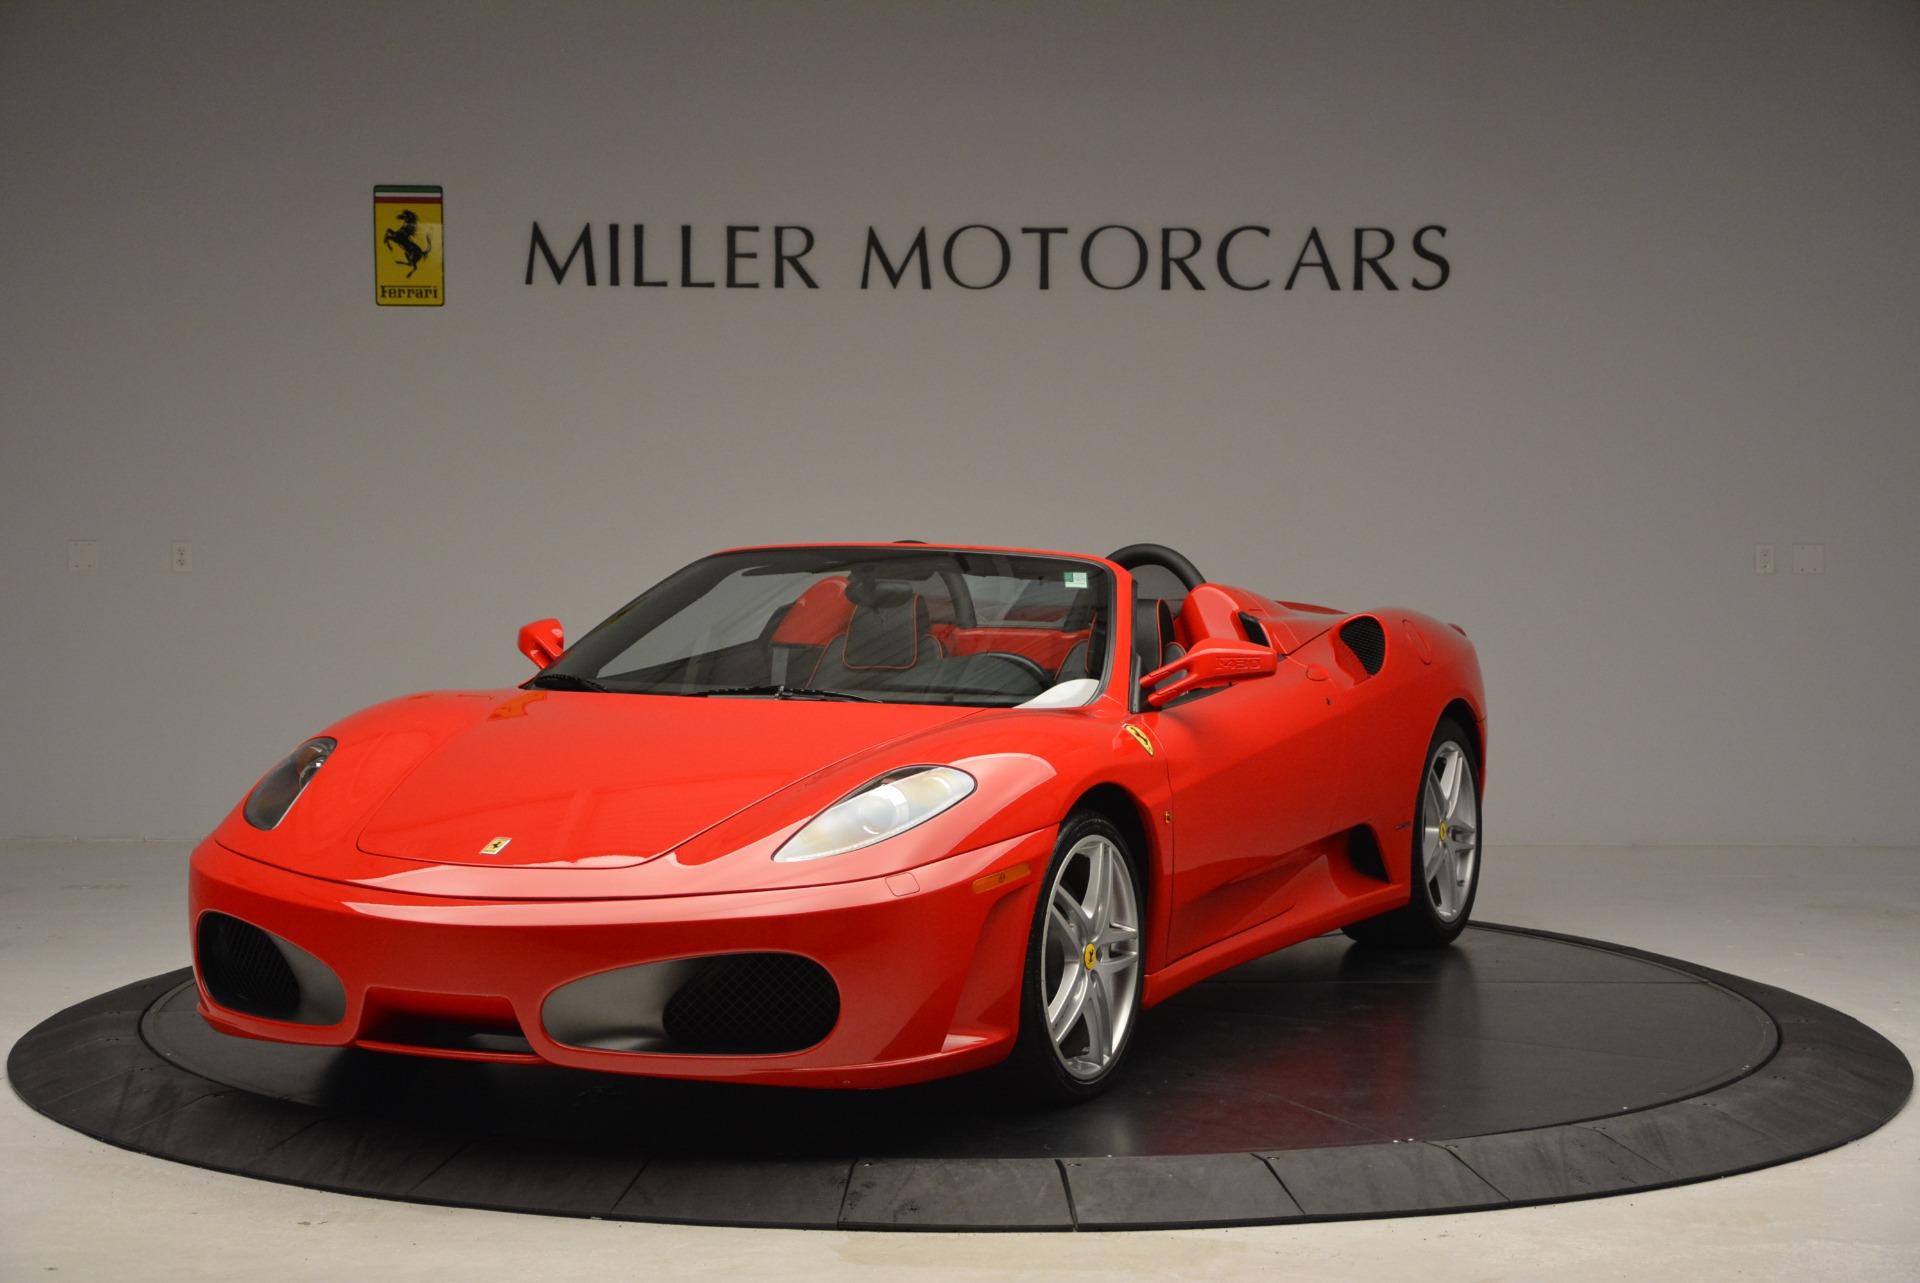 Used 2006 Ferrari F430 SPIDER F1 Spider for sale Sold at McLaren Greenwich in Greenwich CT 06830 1